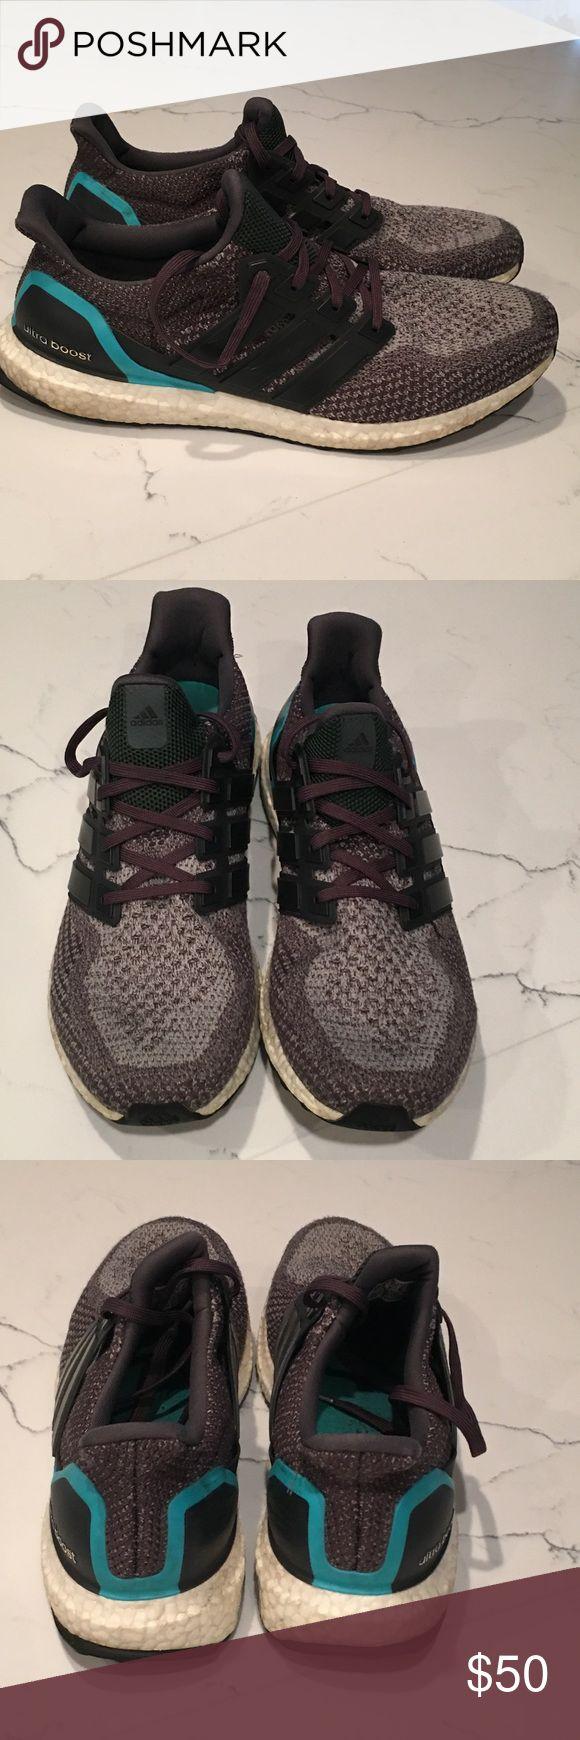 adidas ultra boost mens size 13 adidas uk sizing to us